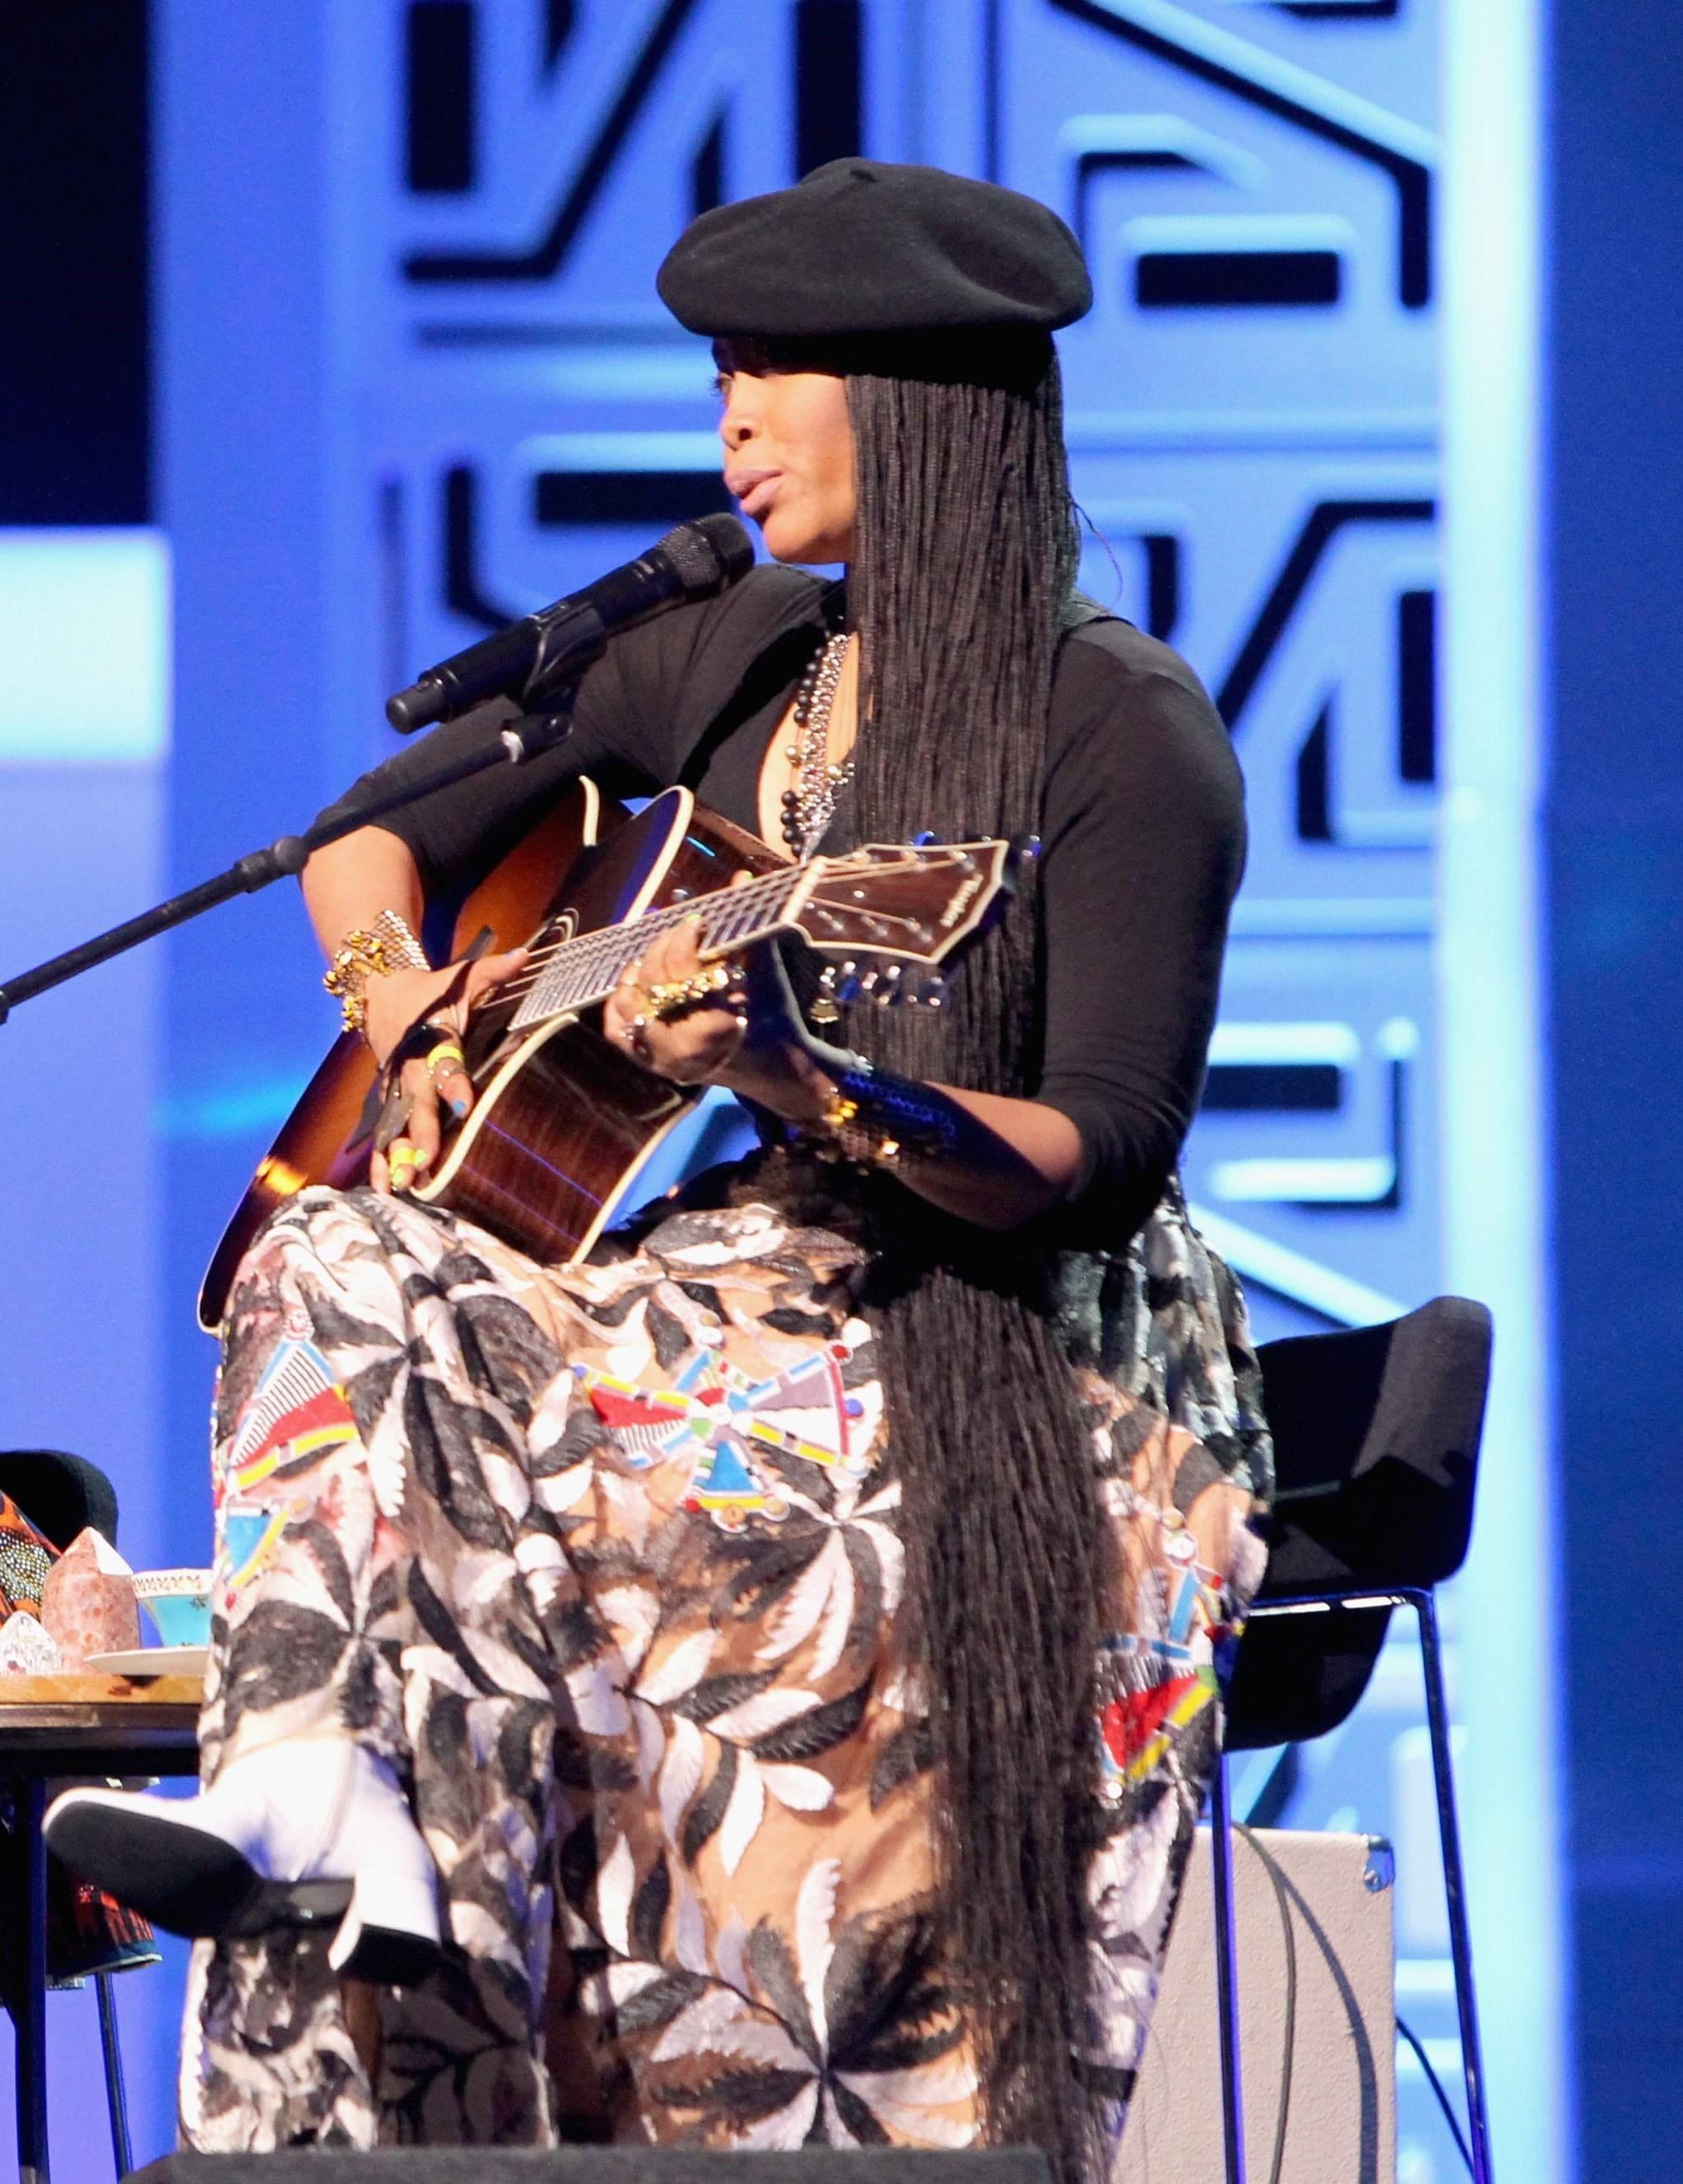 Soul Train Awards 2016: All Things Hair - IMAGE - Erykah badu